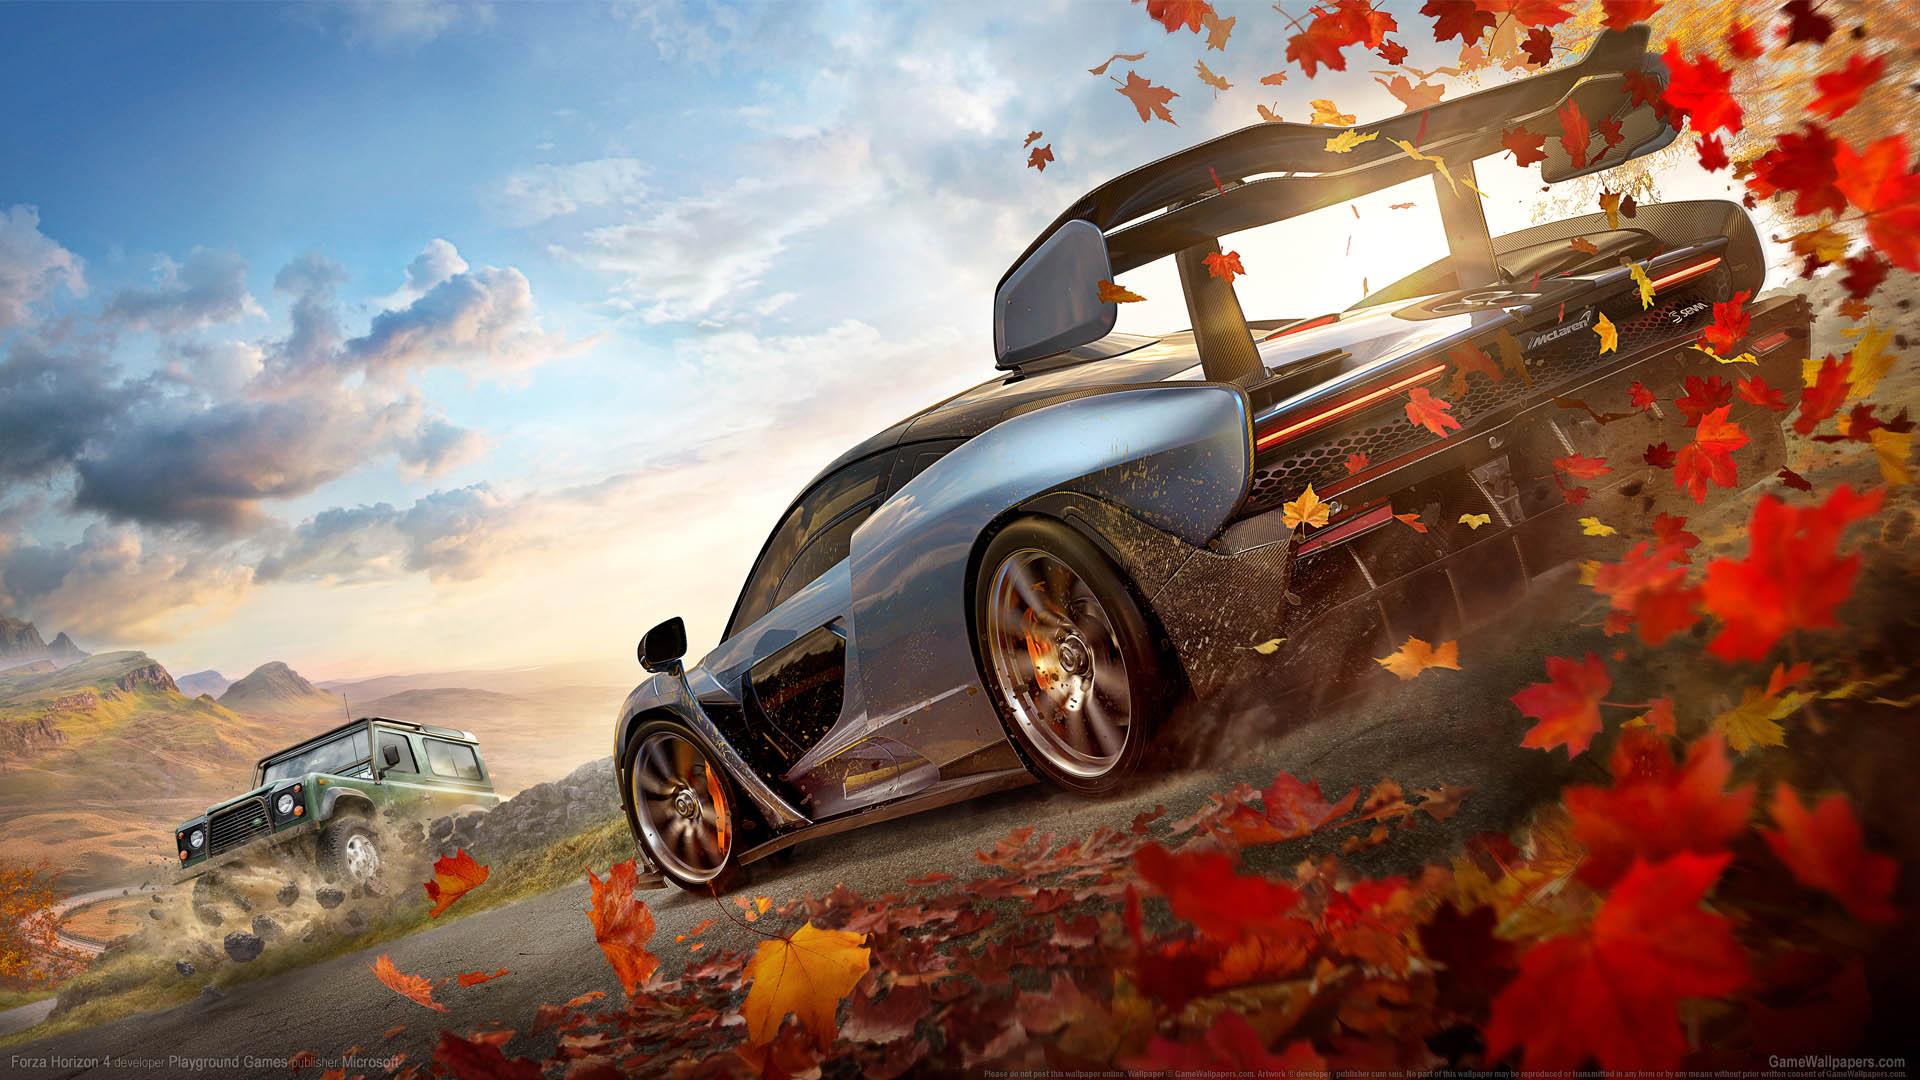 Forza Horizon 4 wallpaper 01 1920x1080